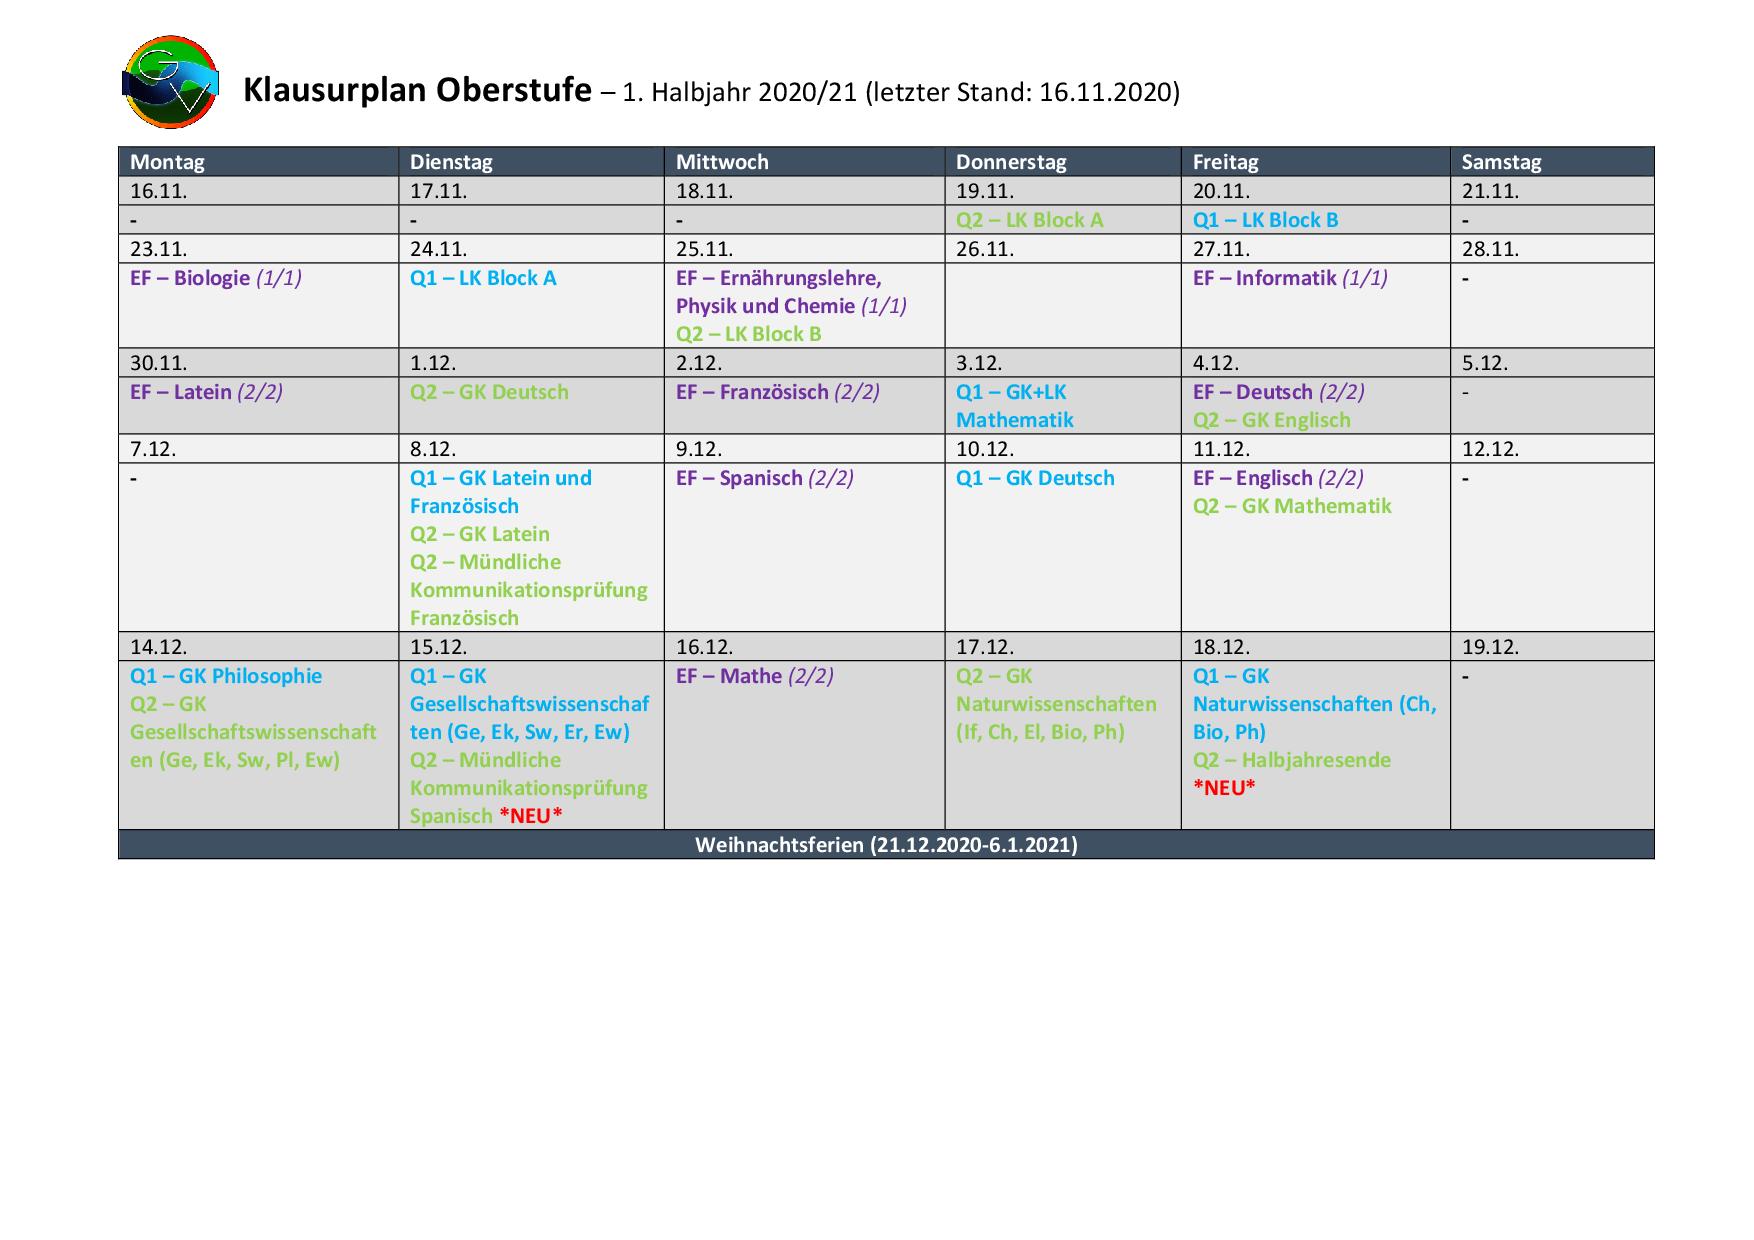 2020-11-16_Klausurplan-Oberstufe-1HJ-003